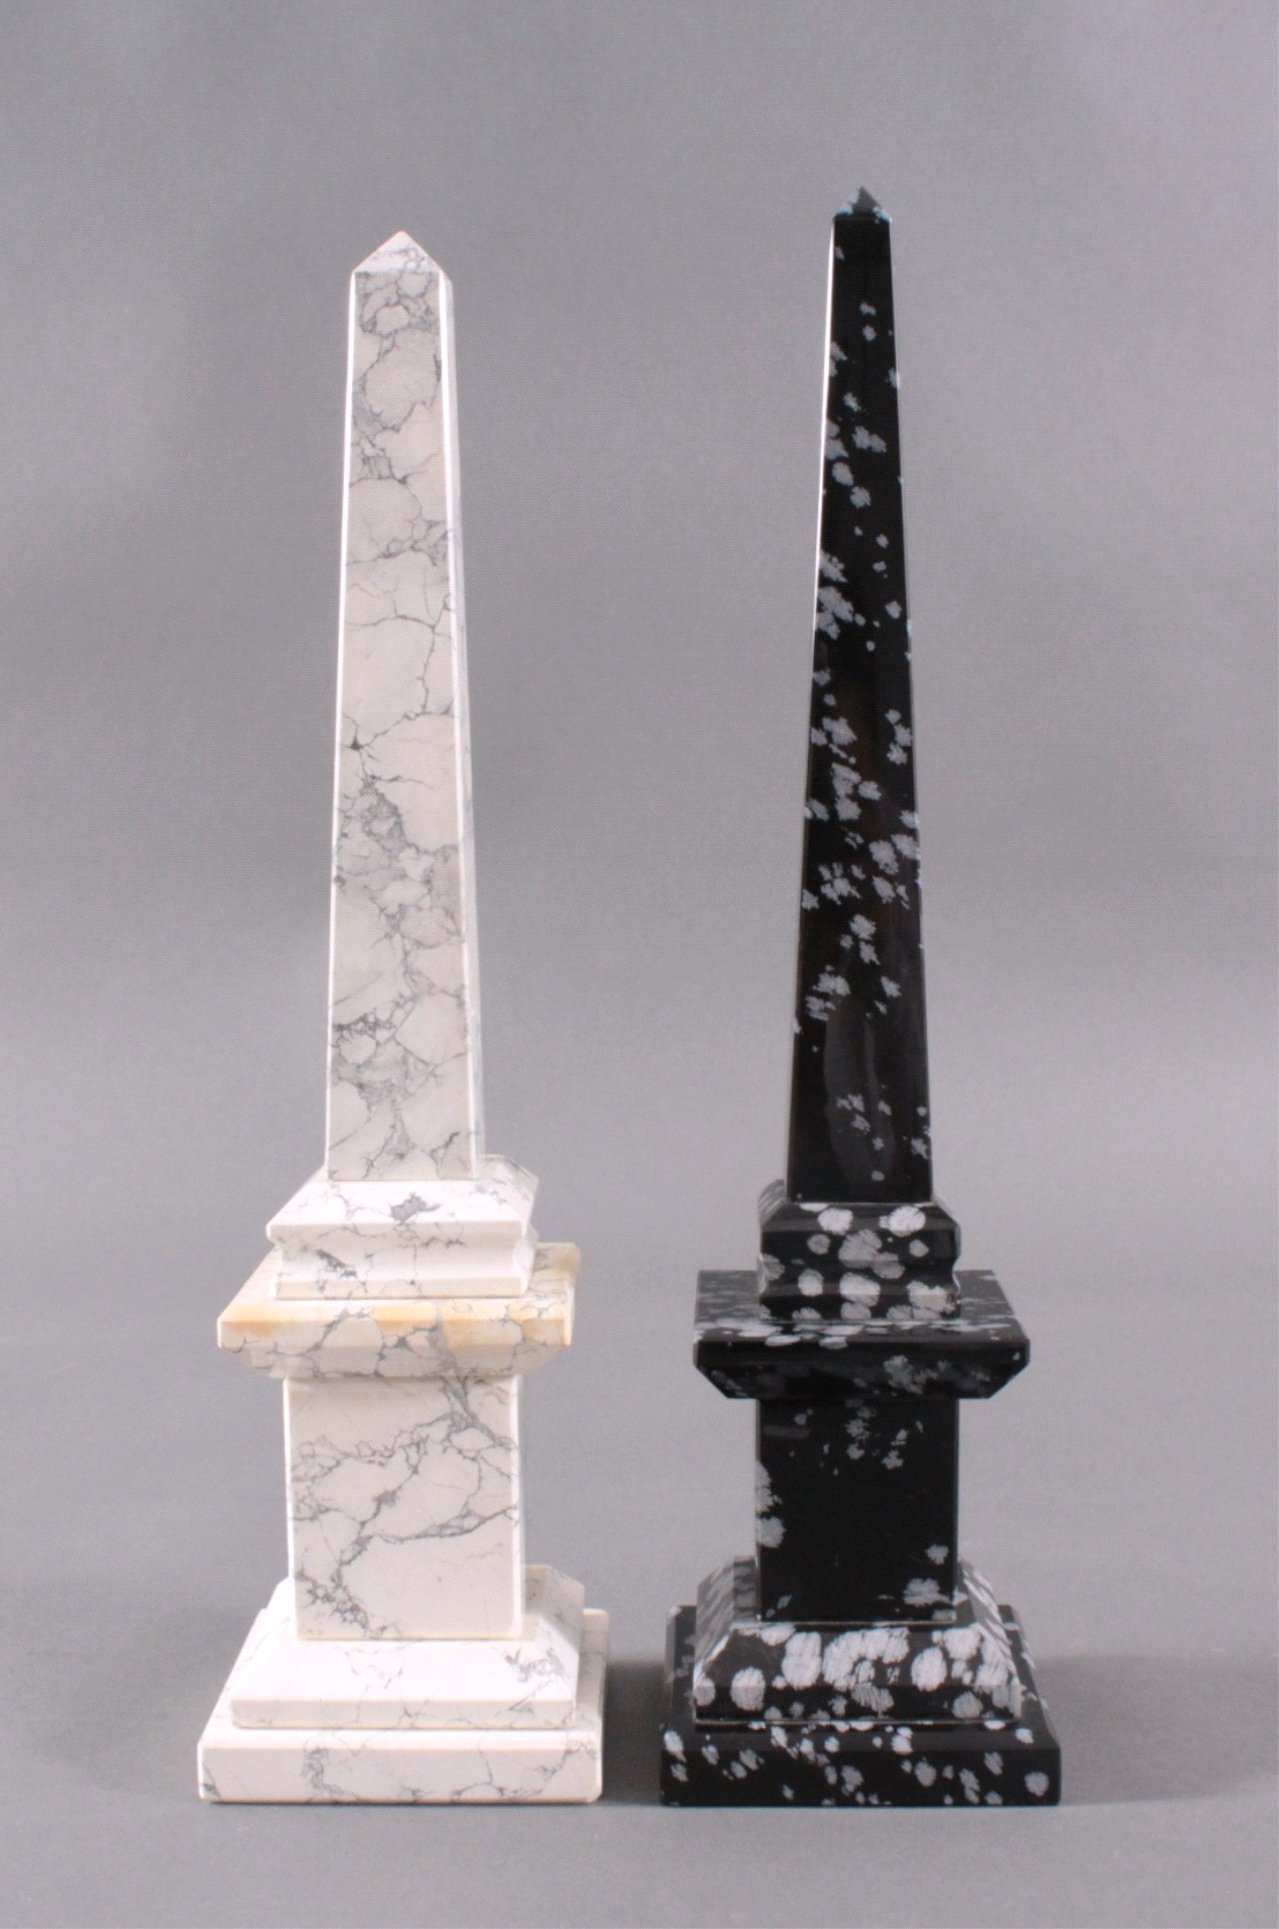 2 Edelstein-Obelisken